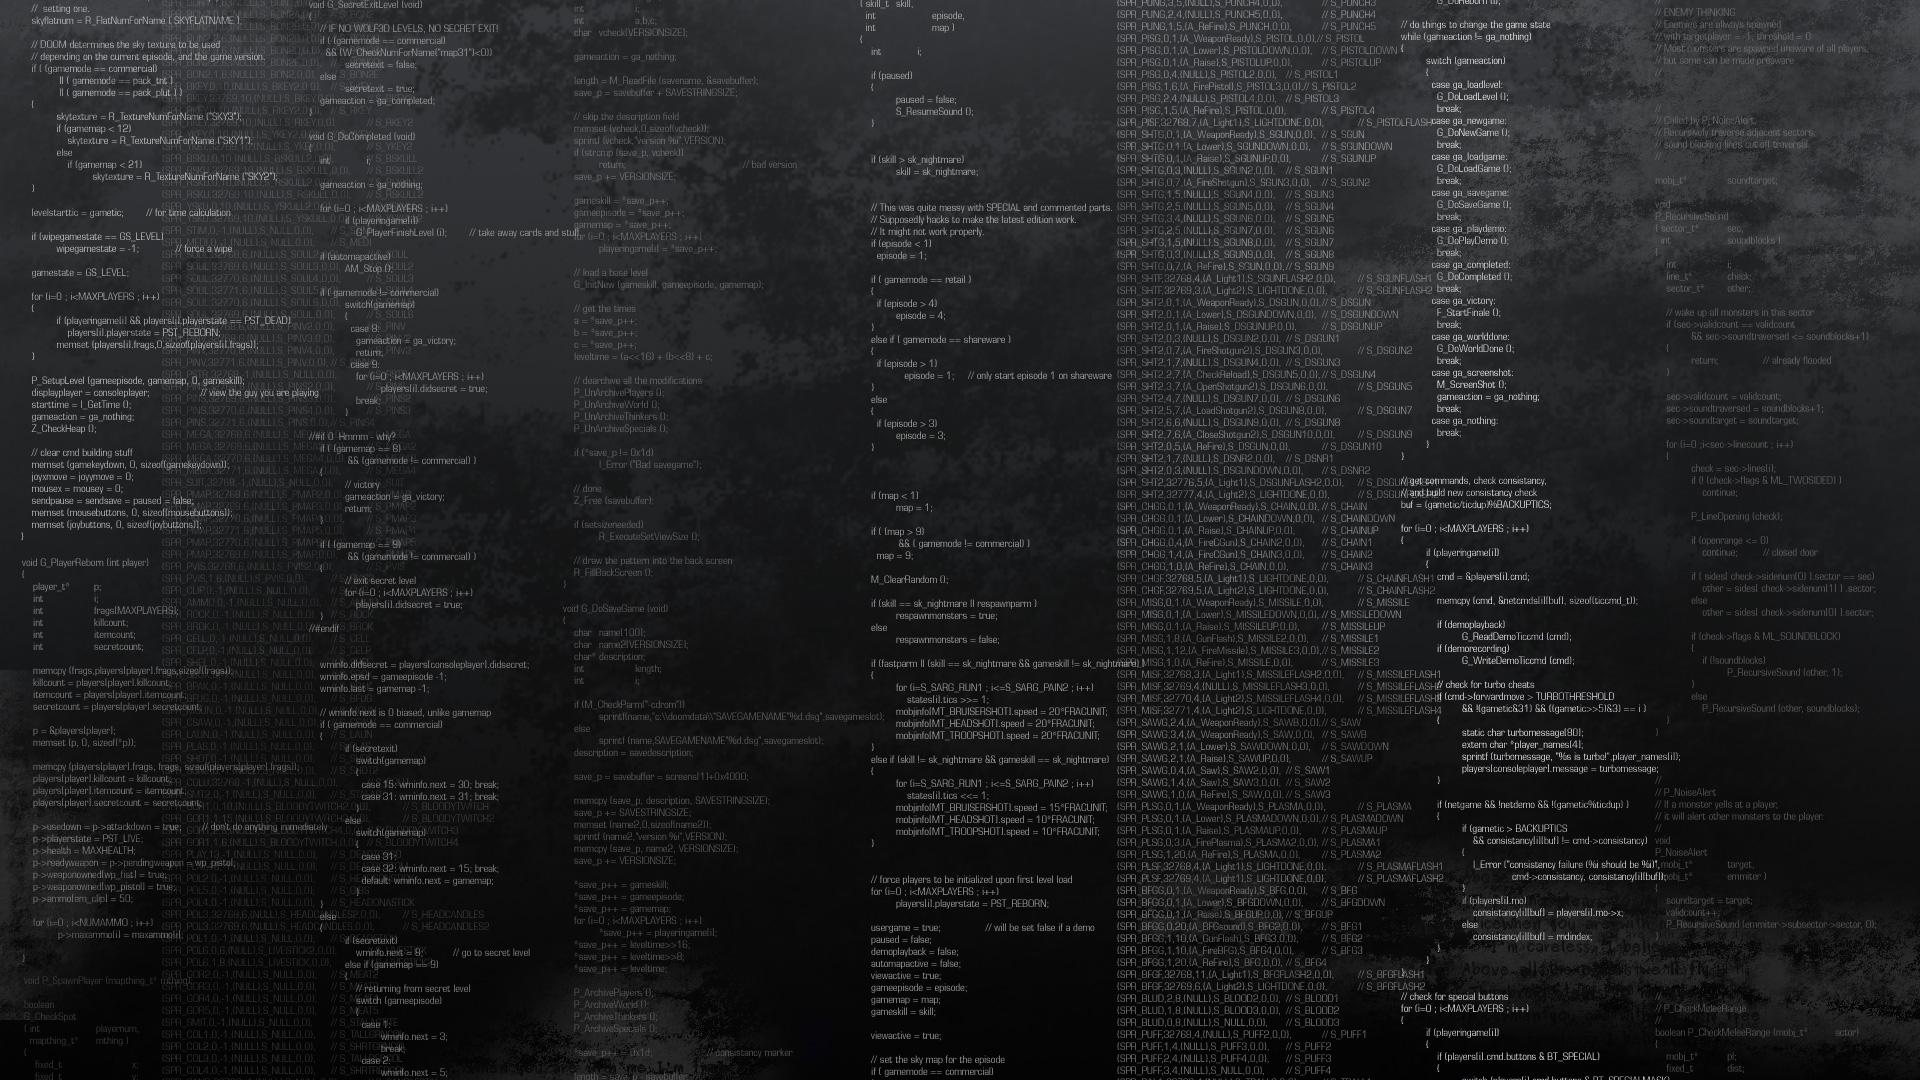 Code HD Wallpaper FullHDWpp   Full HD Wallpapers 1920x1080 1920x1080